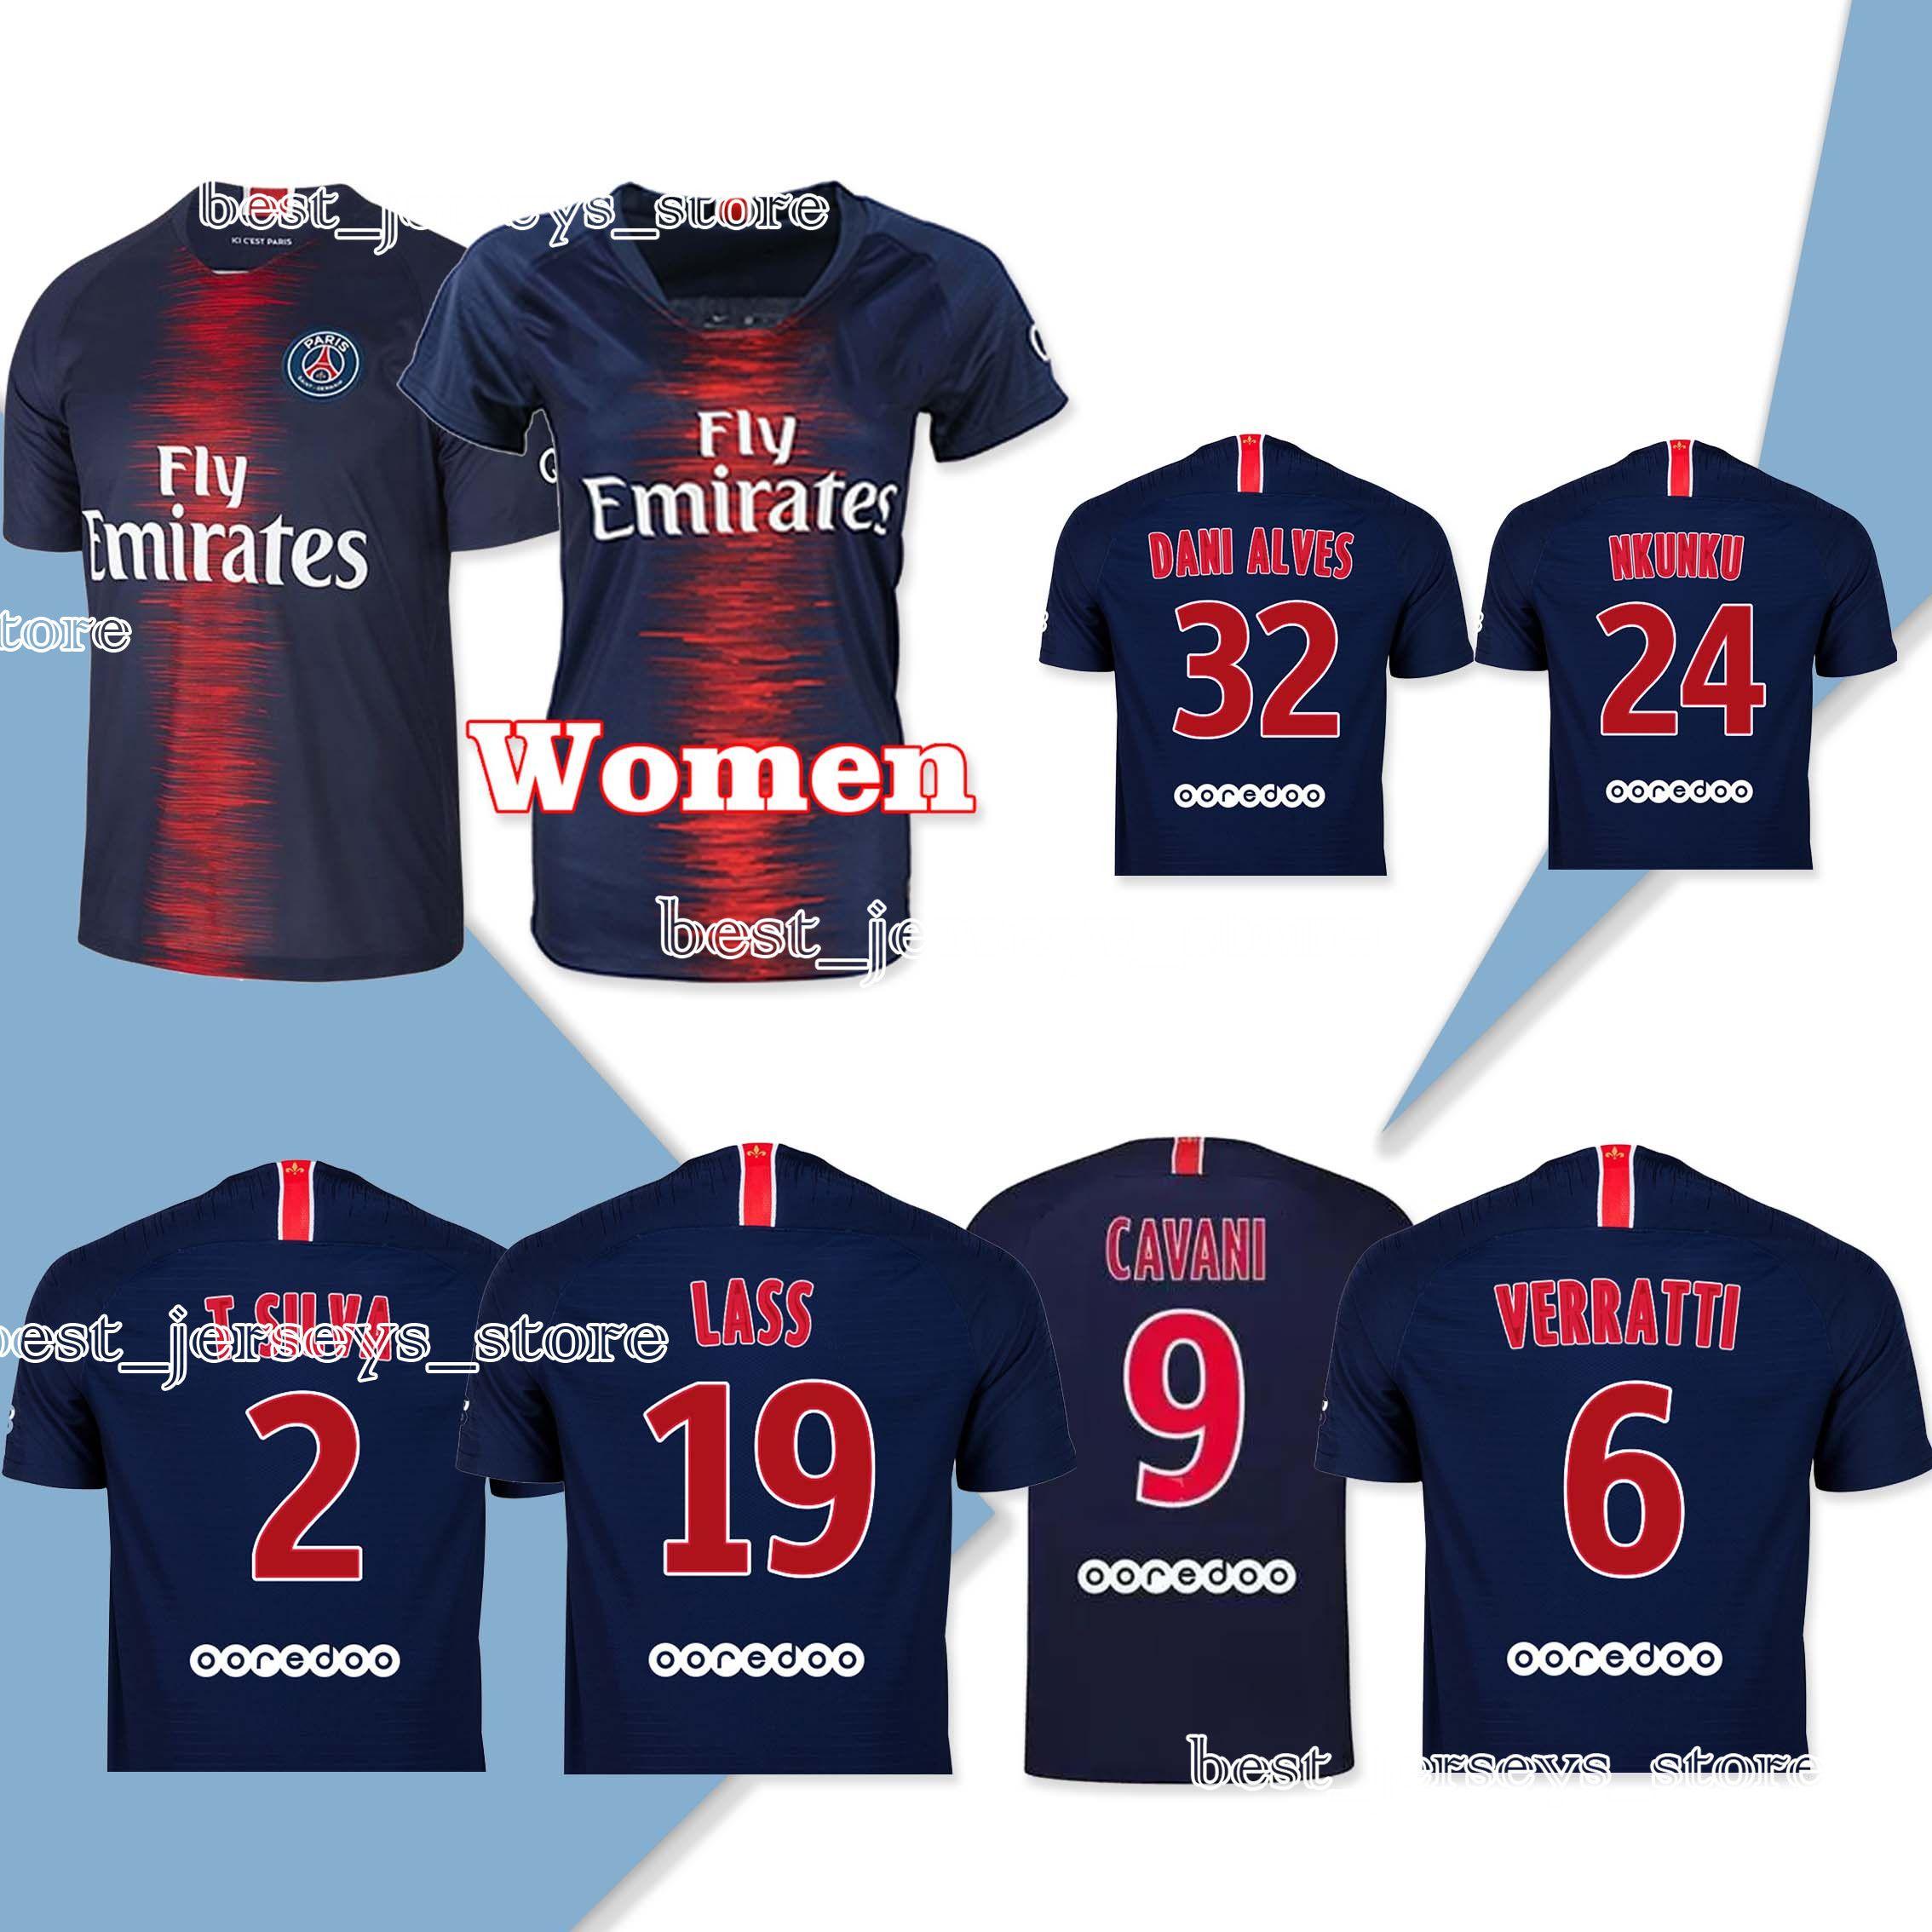 2b37593999321 18 19 Player Version PSG  6 VERRATTI Home Soccer Jersey 2019 Paris Saint  Germain Home Soccer Shirt  9 Cavani  7 MBAPPE Football Uniform UK 2019 From  ...